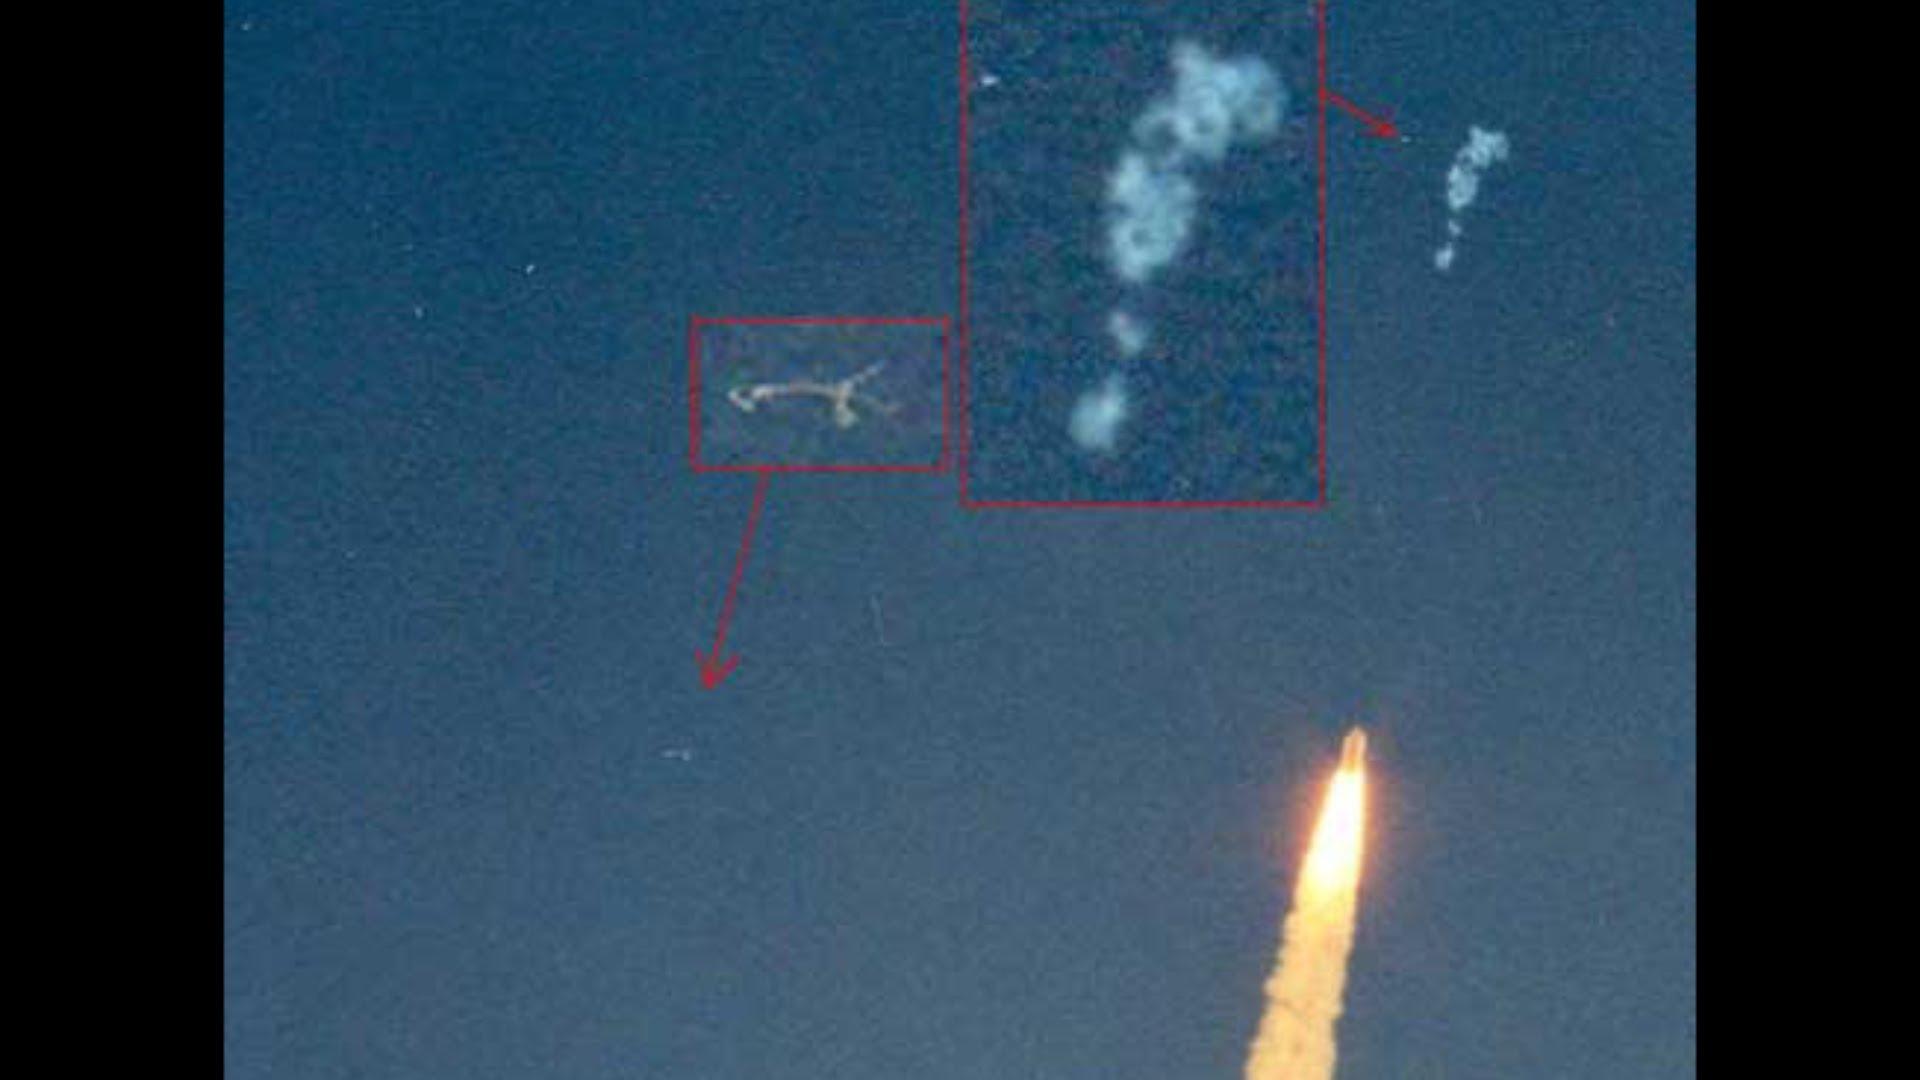 UFO Sightings Strange UFOs Surround Space Shuttle Launch ...